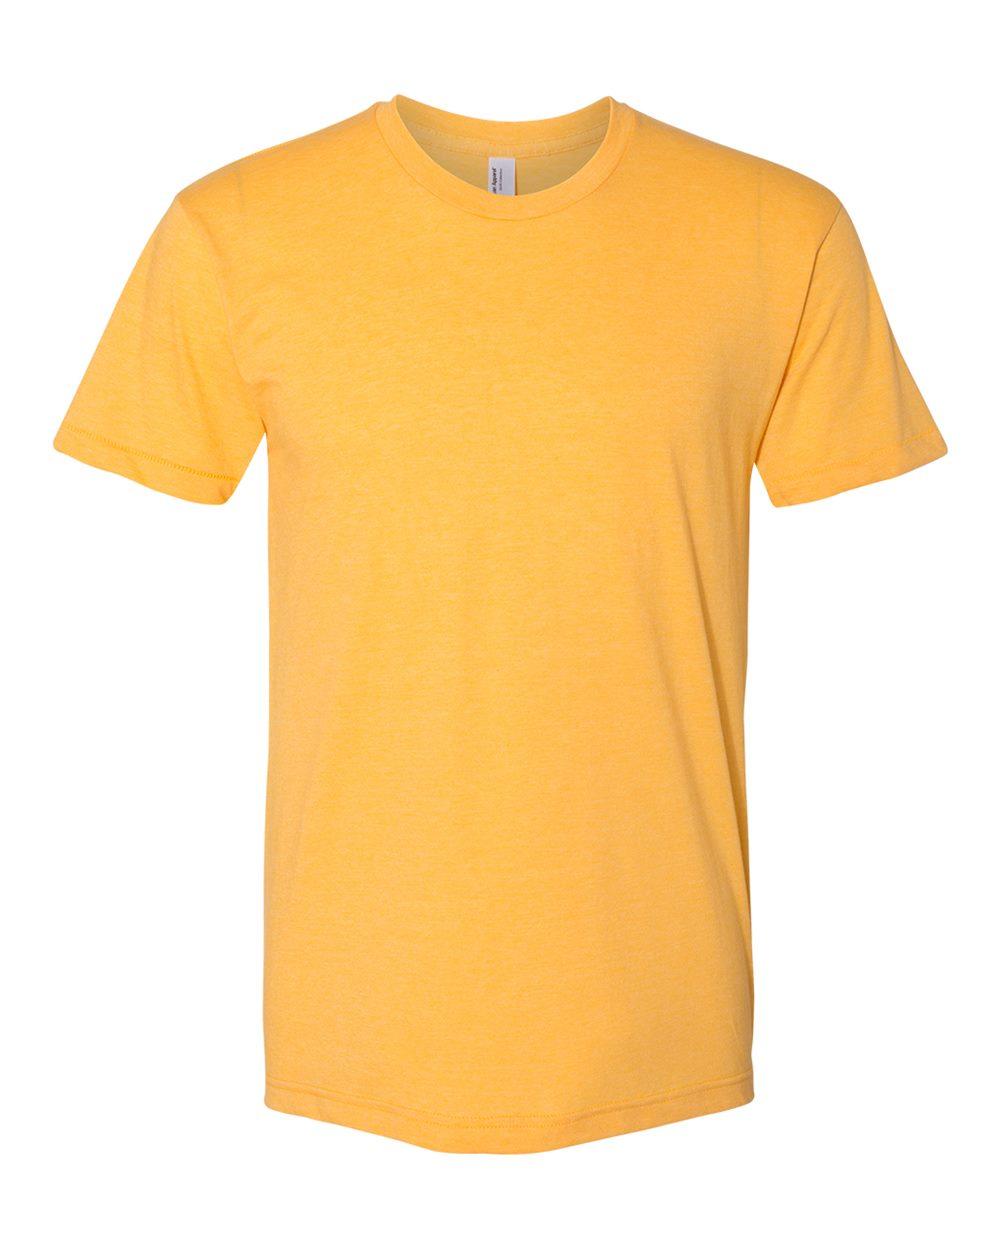 American-Apparel-Mens-Slim-Fit-50-50-Cotton-T-Shirt-Tee-BB401W-up-to-2XL thumbnail 21